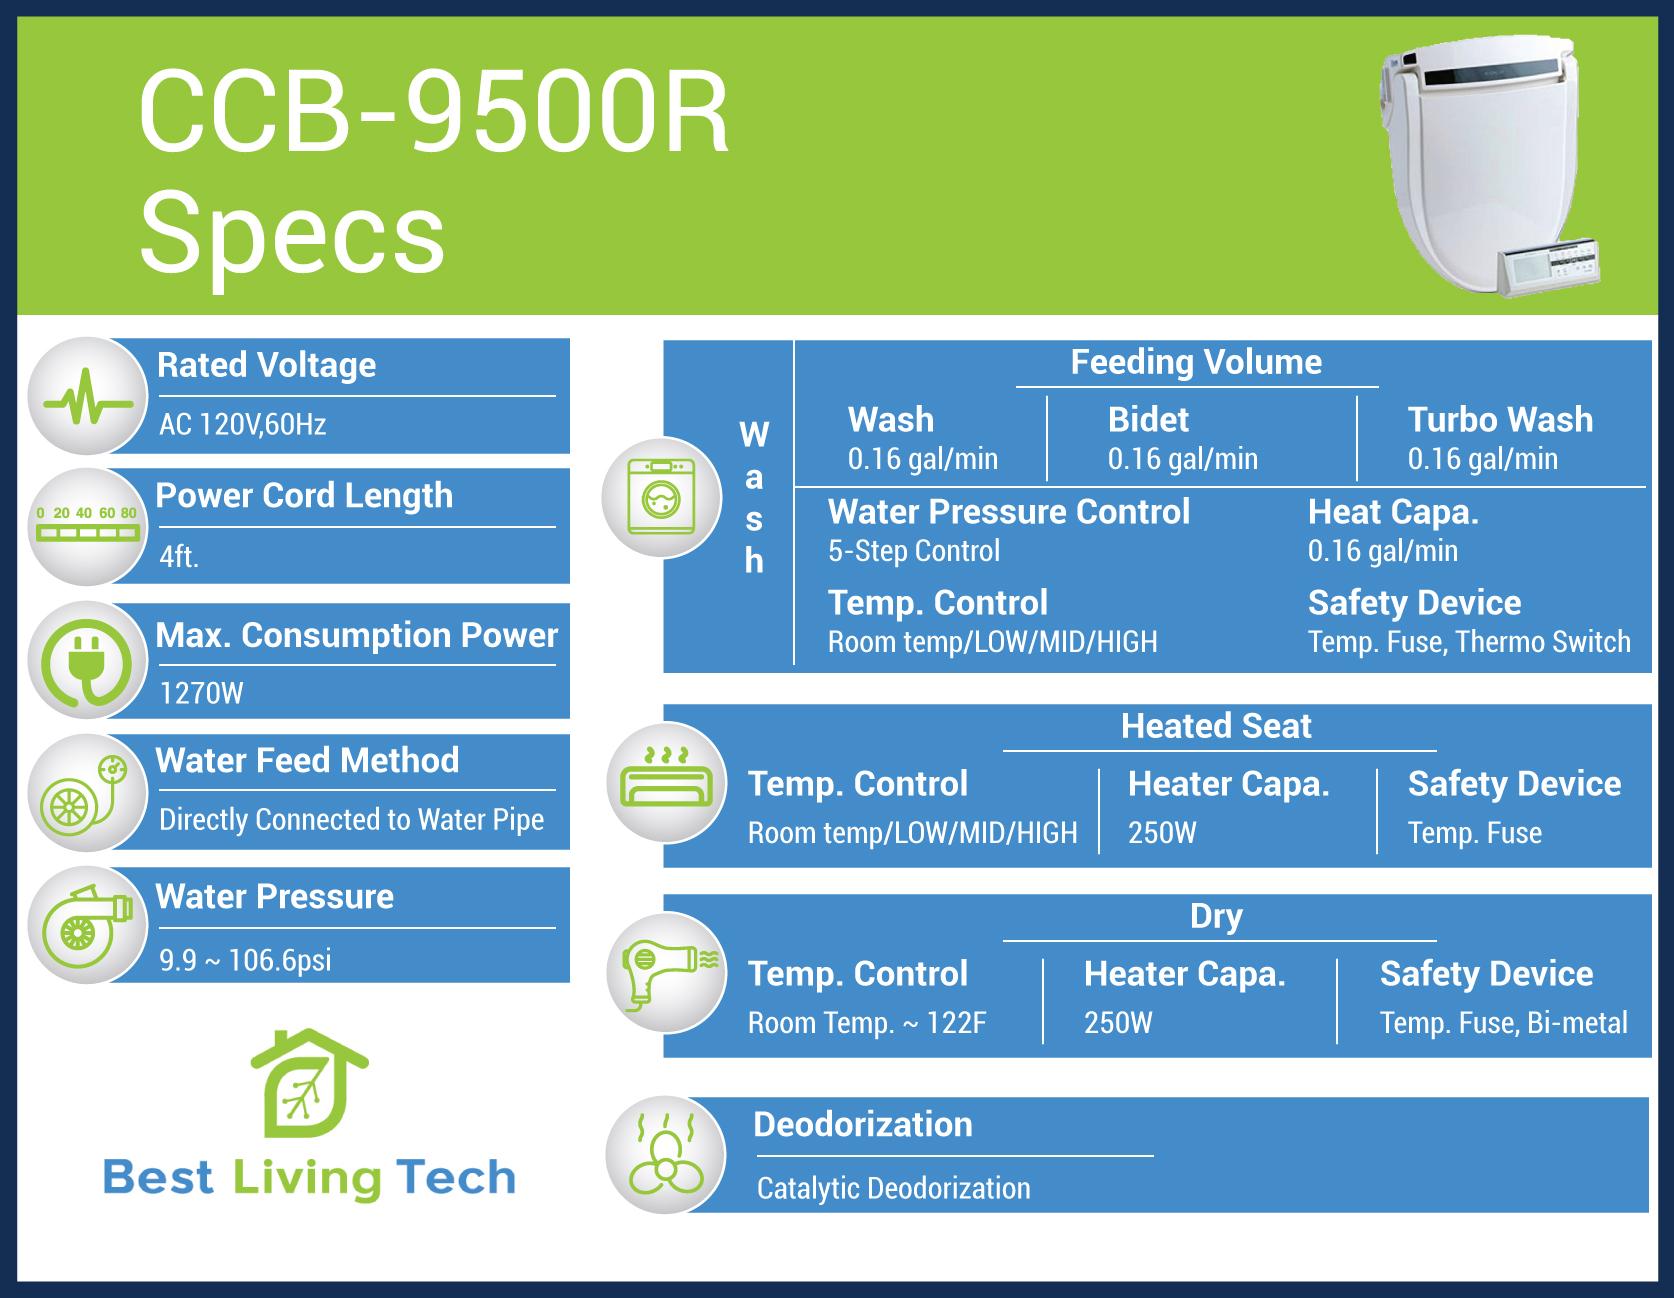 ccb9500r-2.jpg